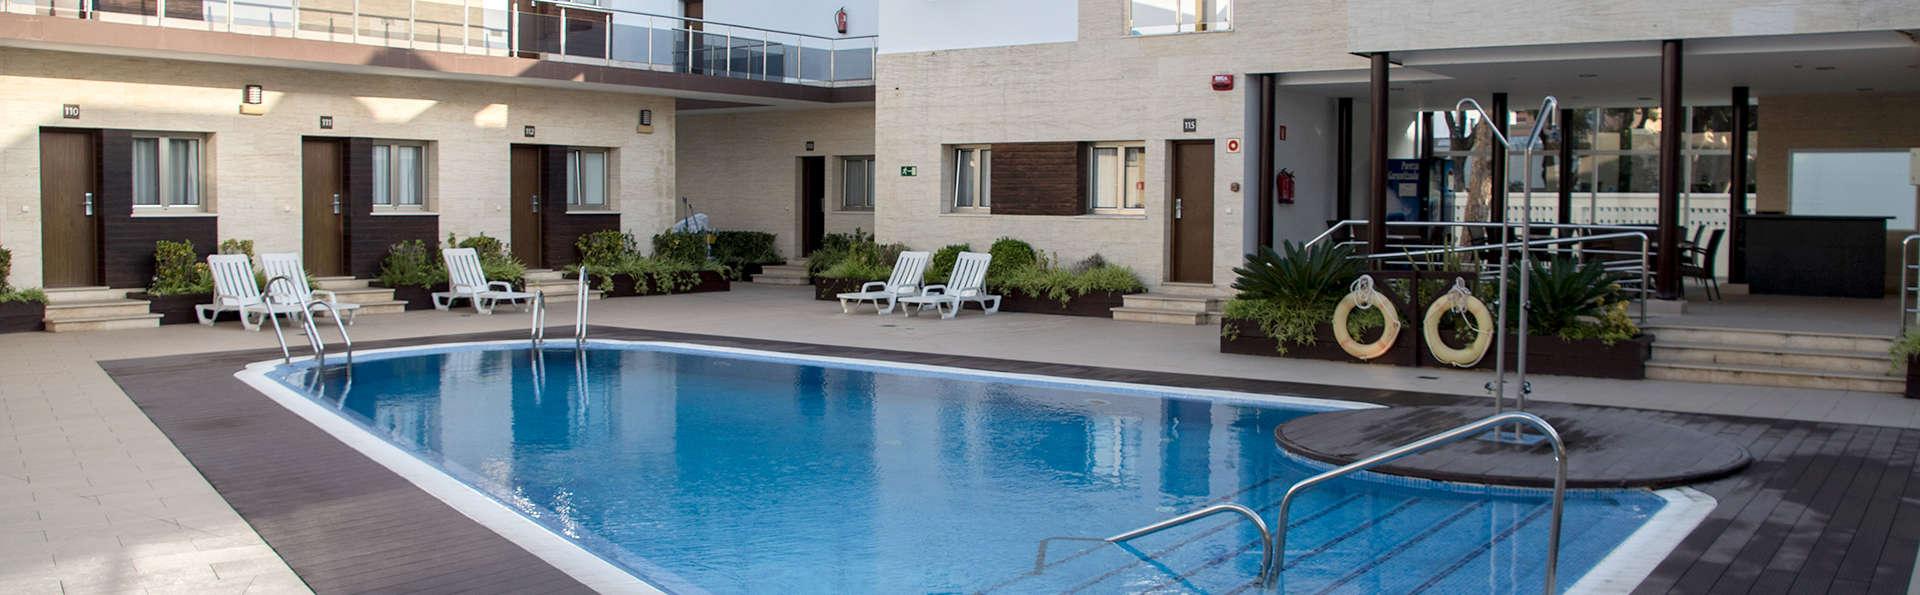 Aparthotel Novo Sancti Petri (inactif) - Edit_Pool.jpg